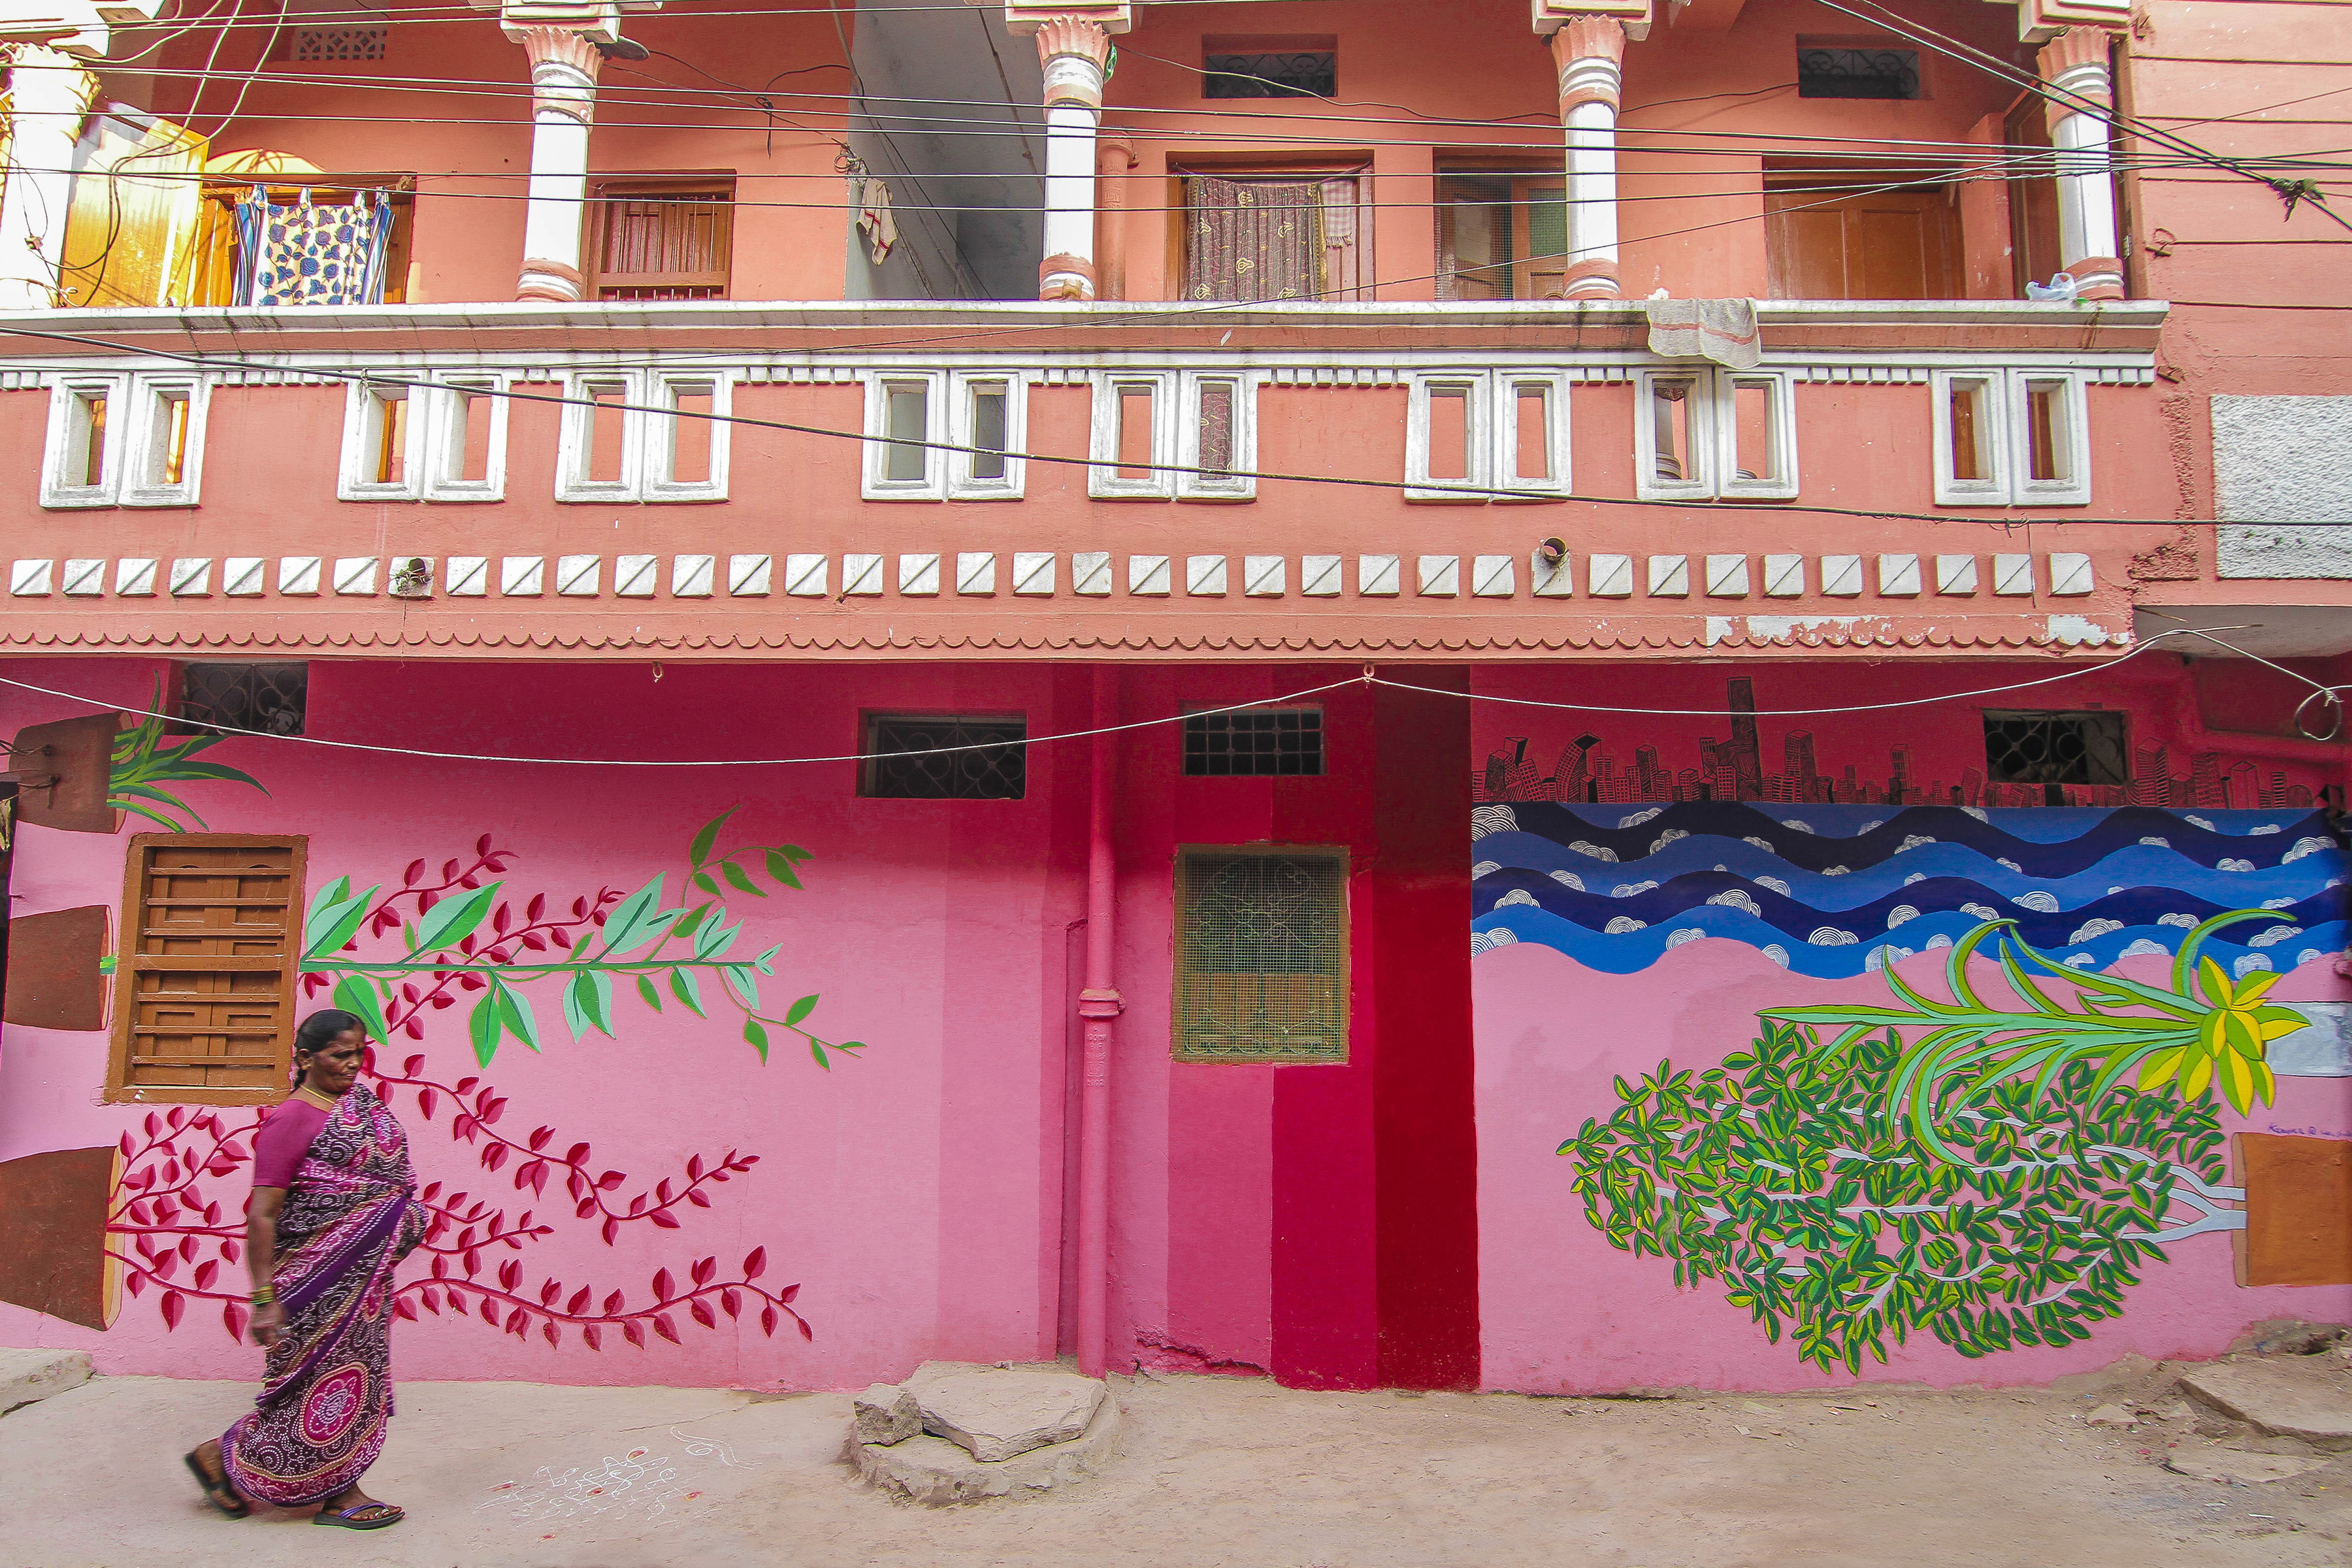 Karuna Sukka Maqta Art District Reveals Pranav Gohil